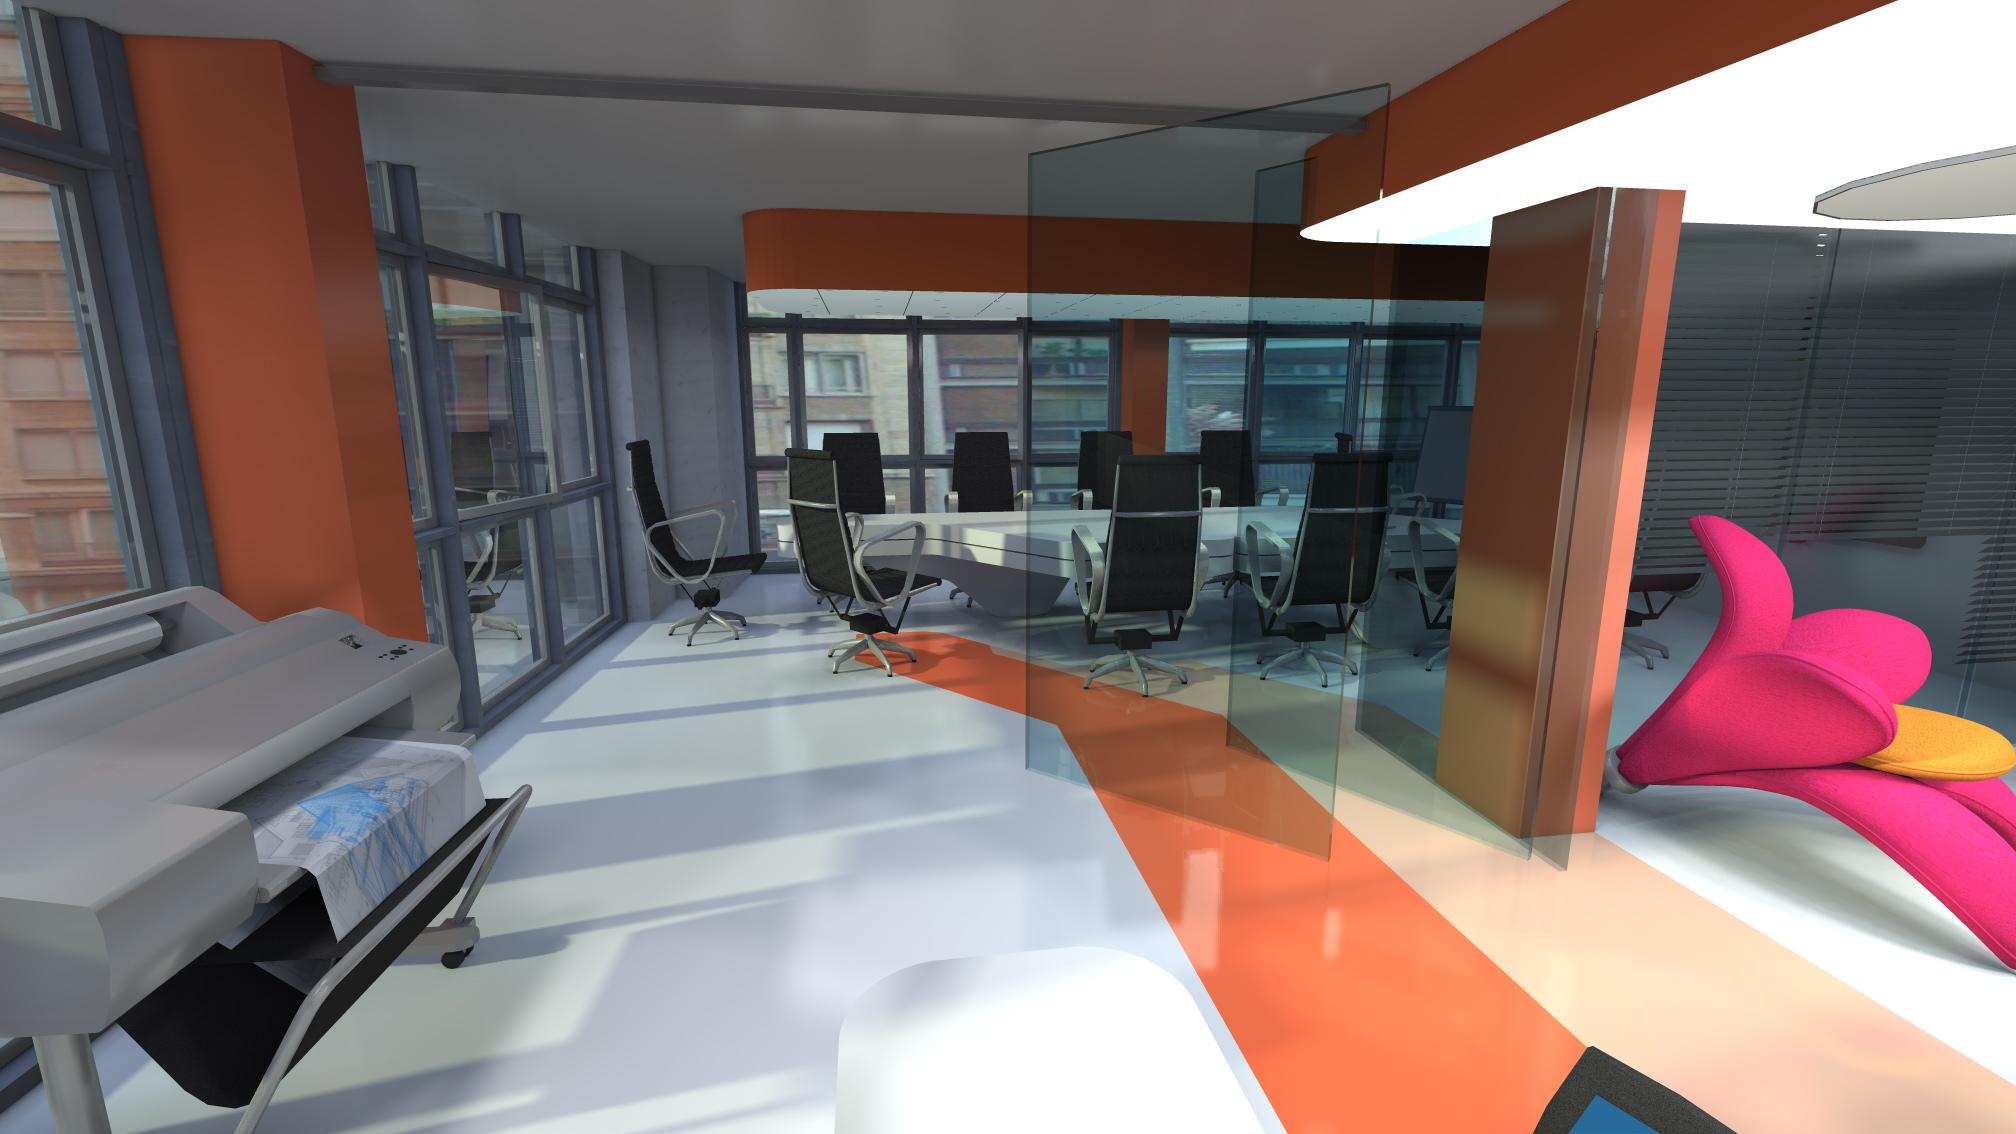 Dise o interior de estudio de arquitectura en barcelona - Estudios de arquitectura en barcelona ...